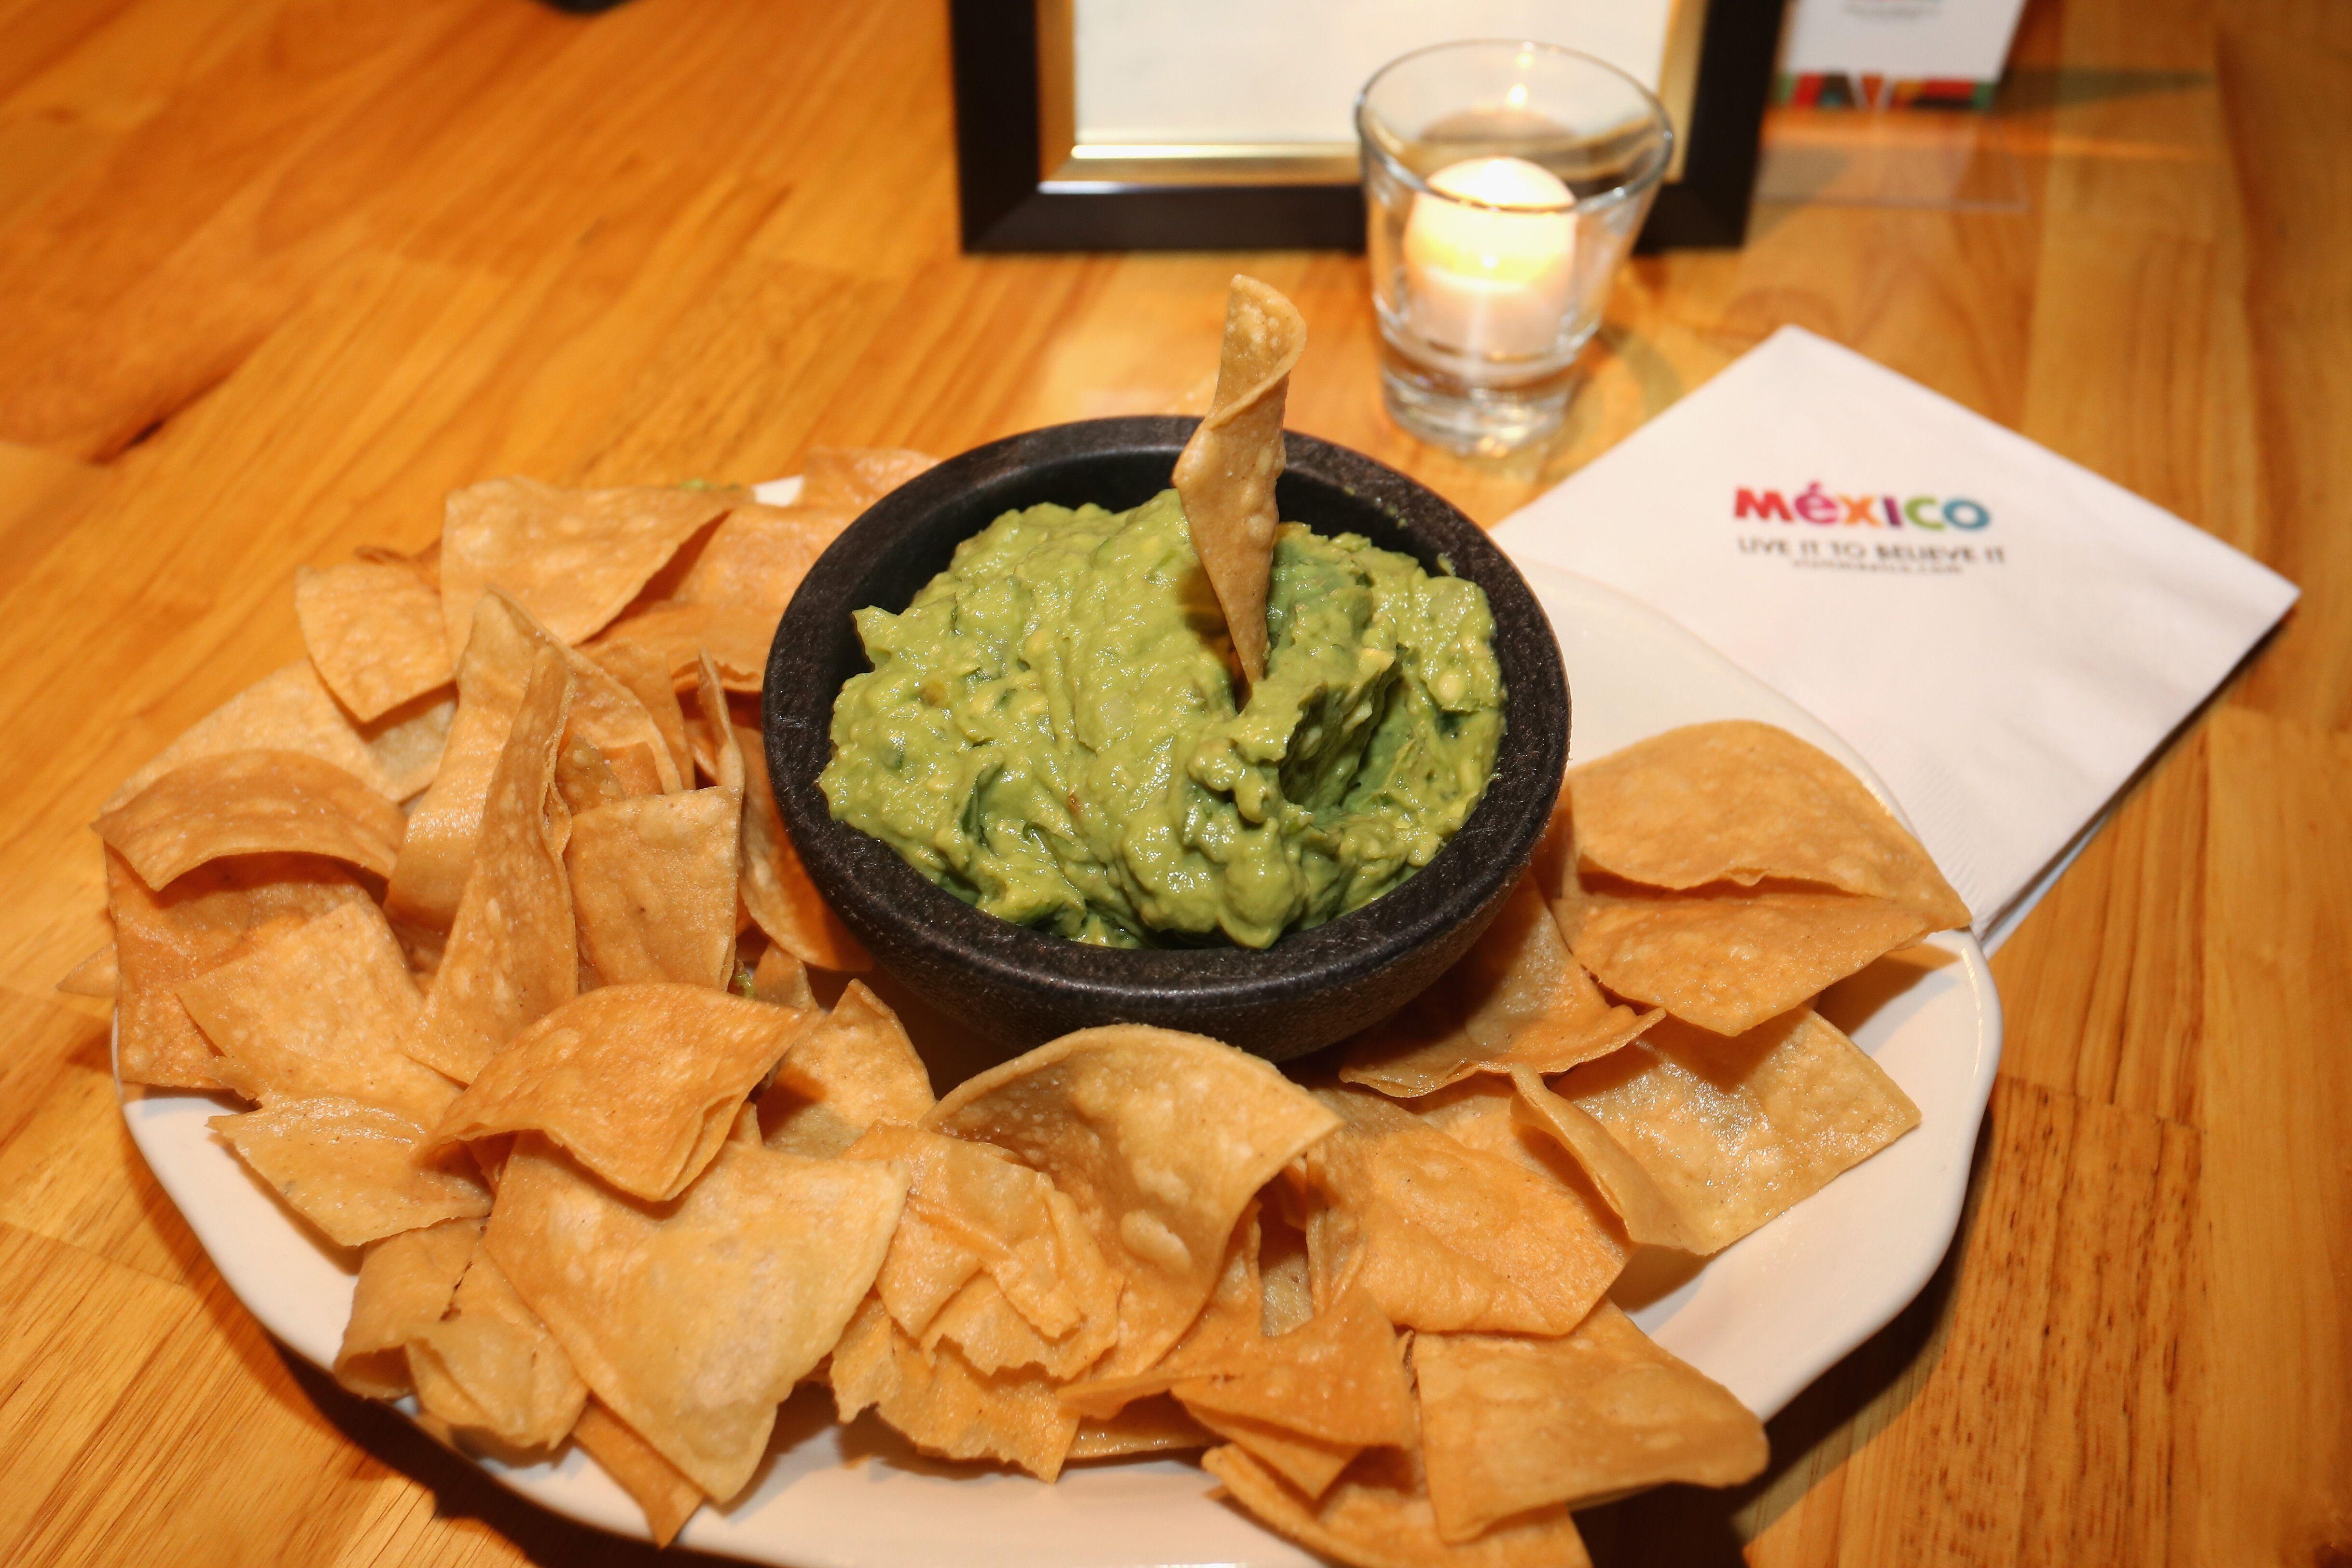 7 tips for the perfect guacamole from guacamolero Ruben Castillo